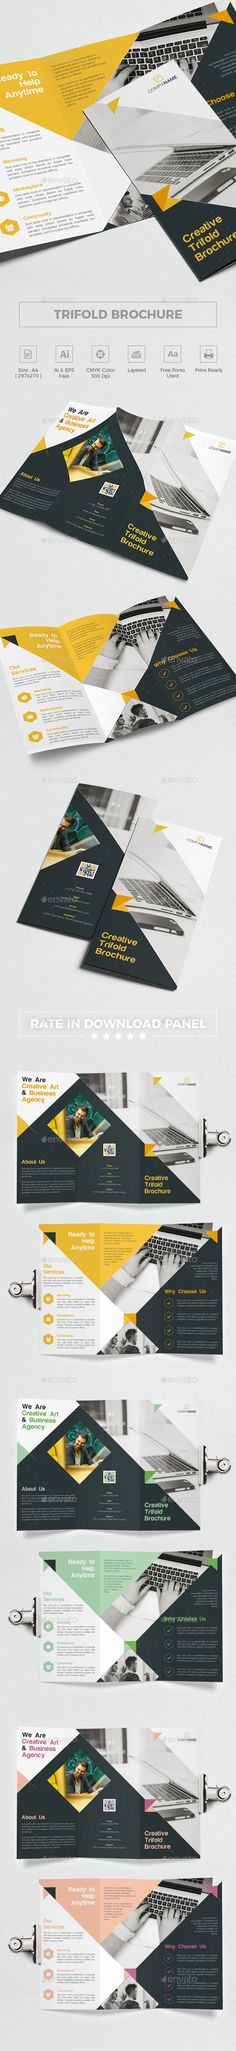 Trifold Brochure Template Vector EPS, AI Illustrator - Download: https://graphicriver.net/item/trifold-brochure/21759708?ref=ksioks